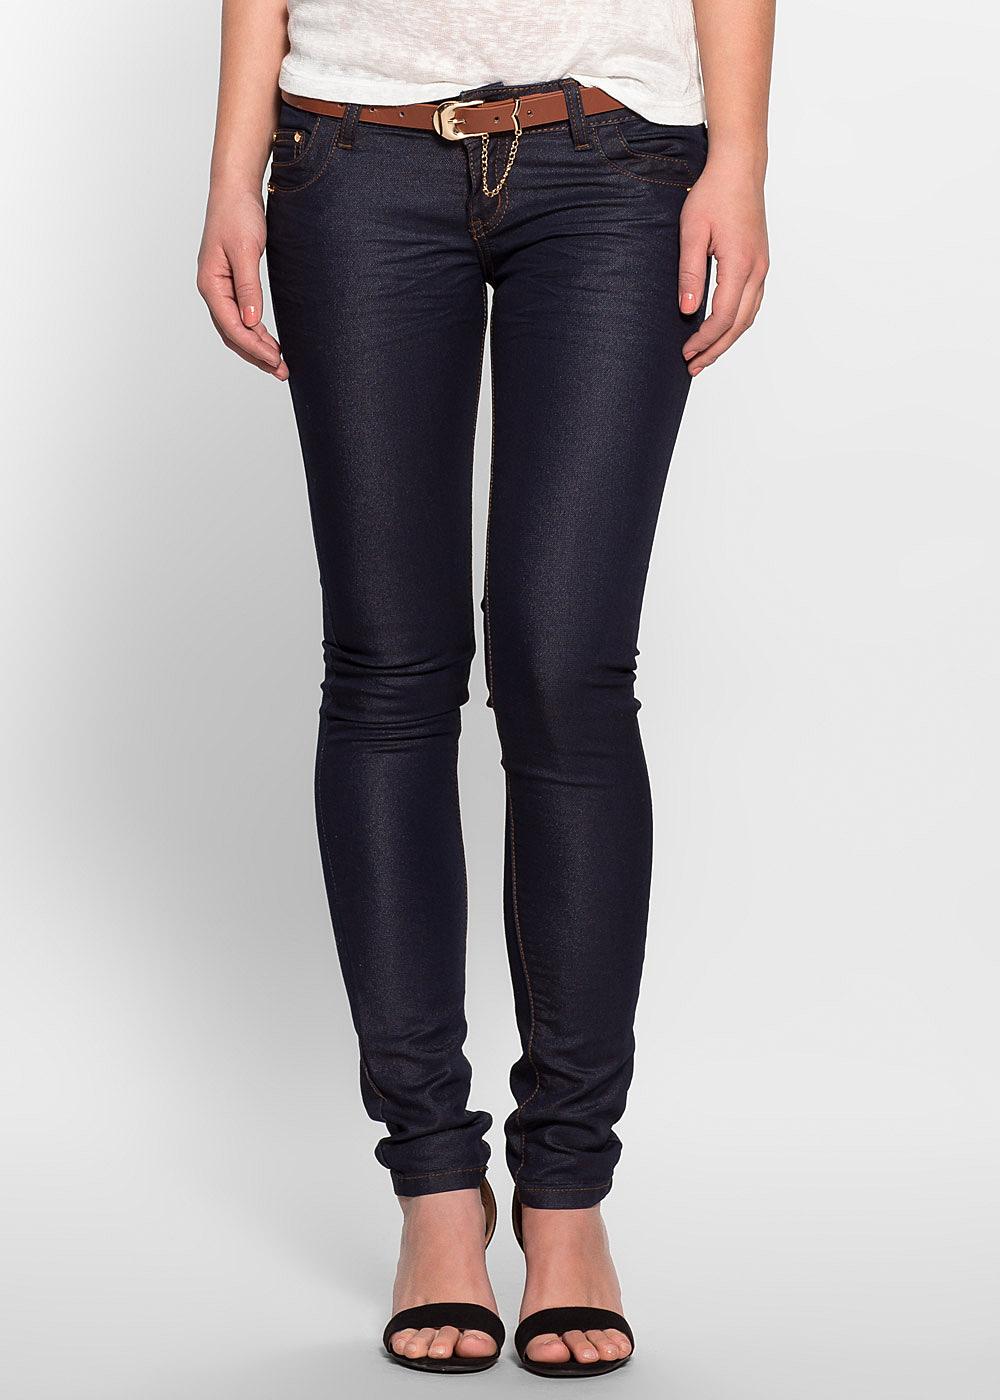 seventyseven lifestyle hose damen jeans mit g rtel 5. Black Bedroom Furniture Sets. Home Design Ideas